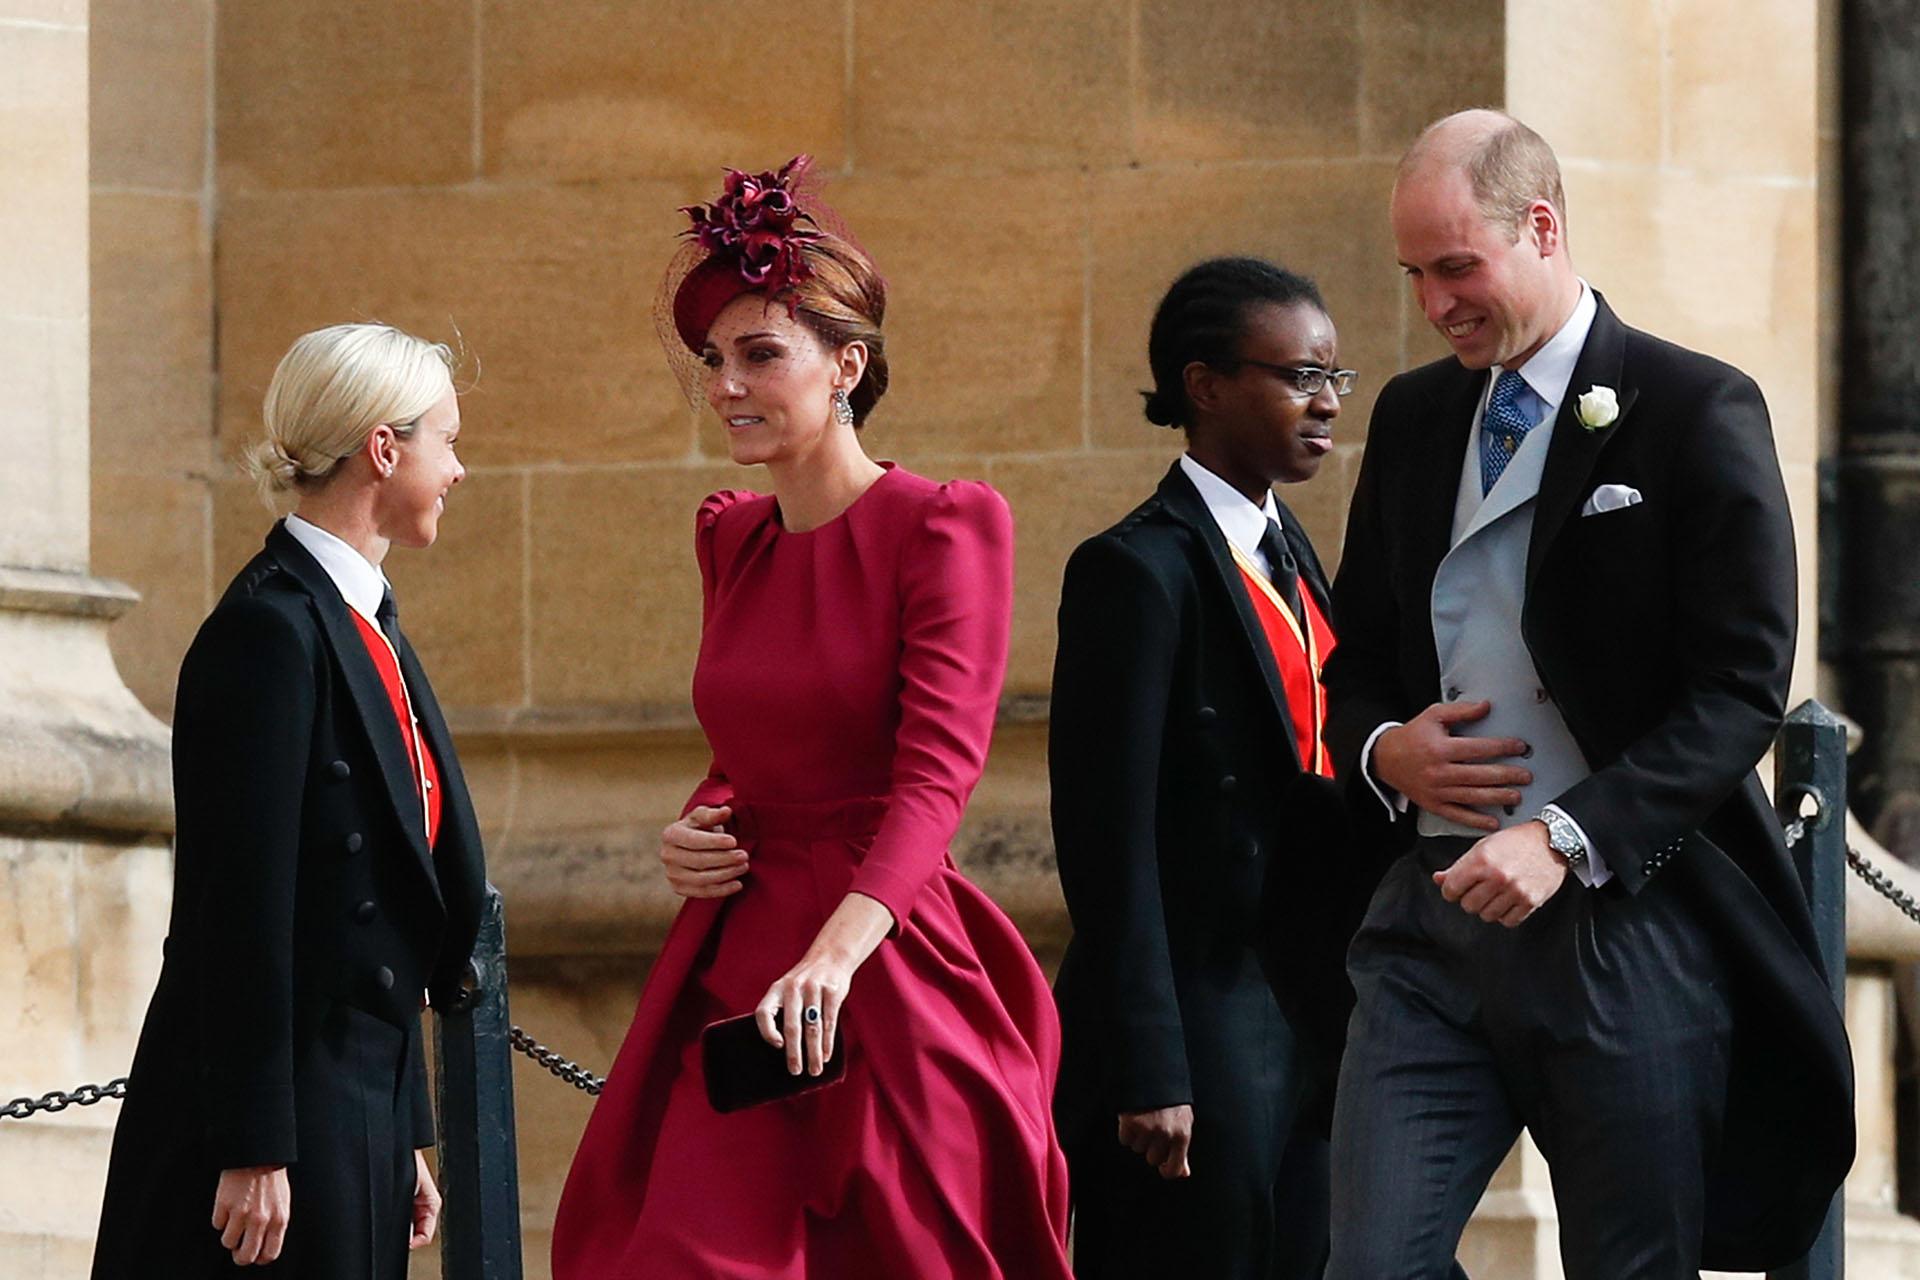 Los Duques de Cambridge, Kate Middleton y William